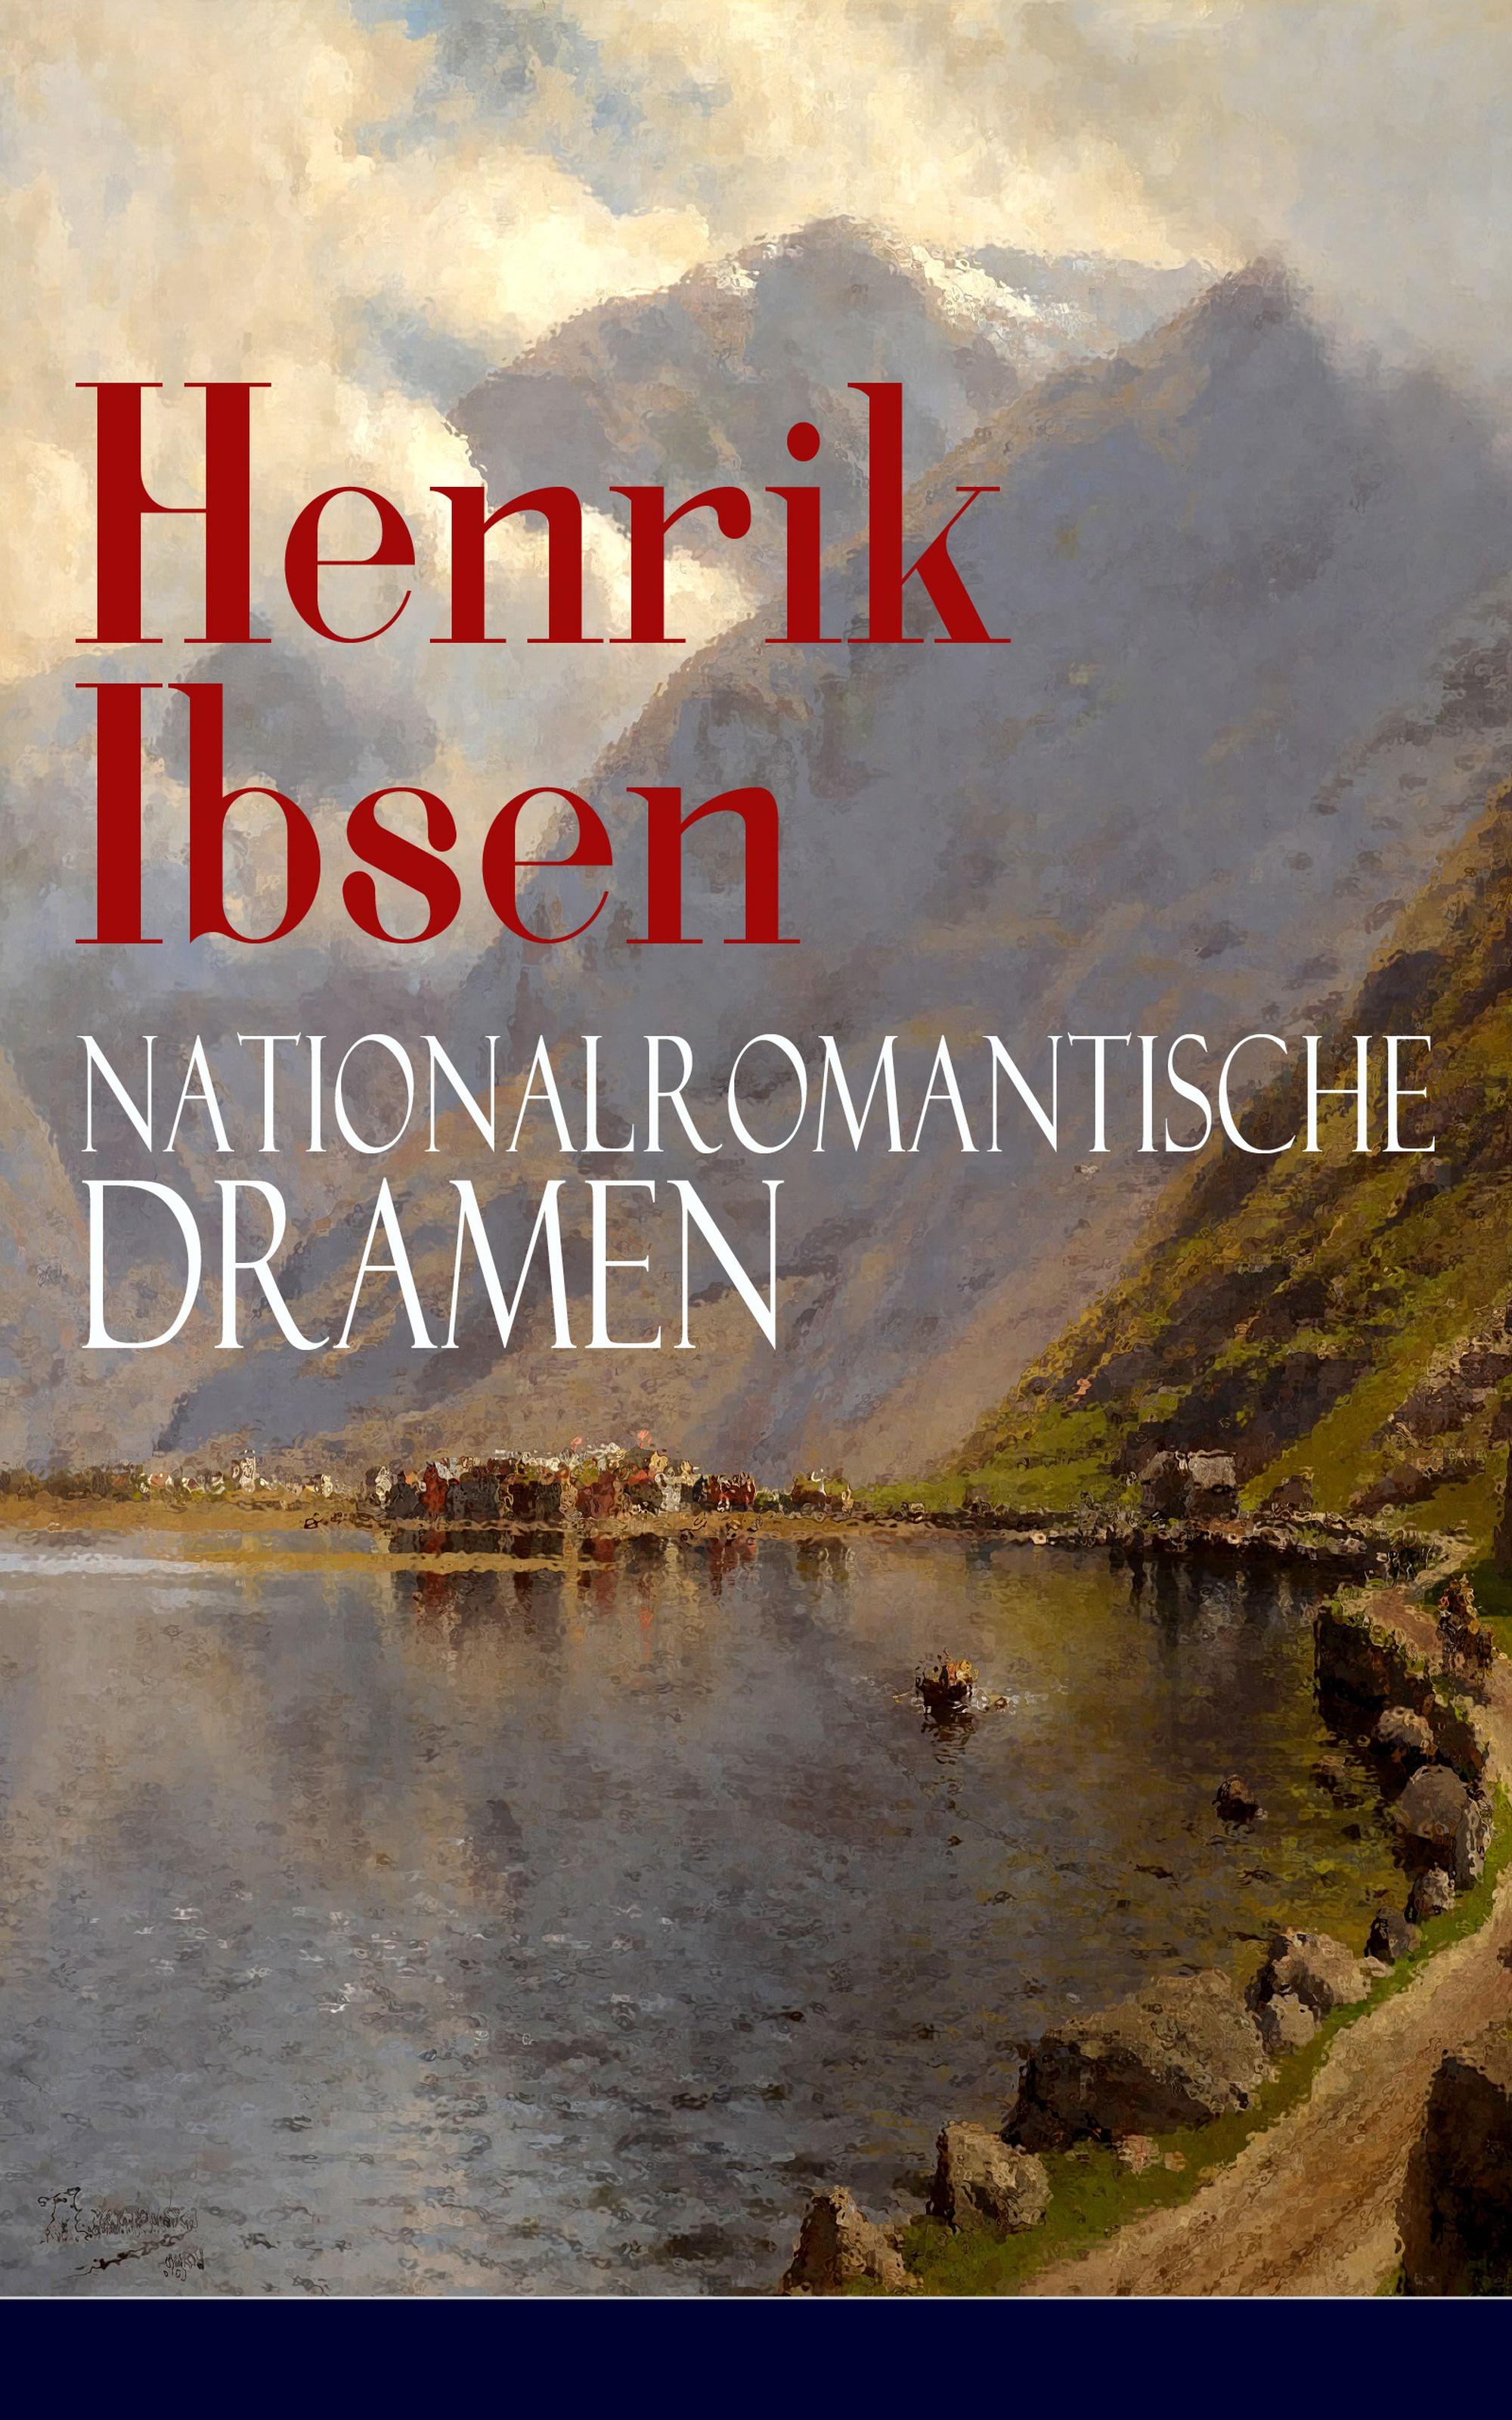 Henrik Ibsen Henrik Ibsen: Nationalromantische Dramen henrik ibsen gesammelte werke